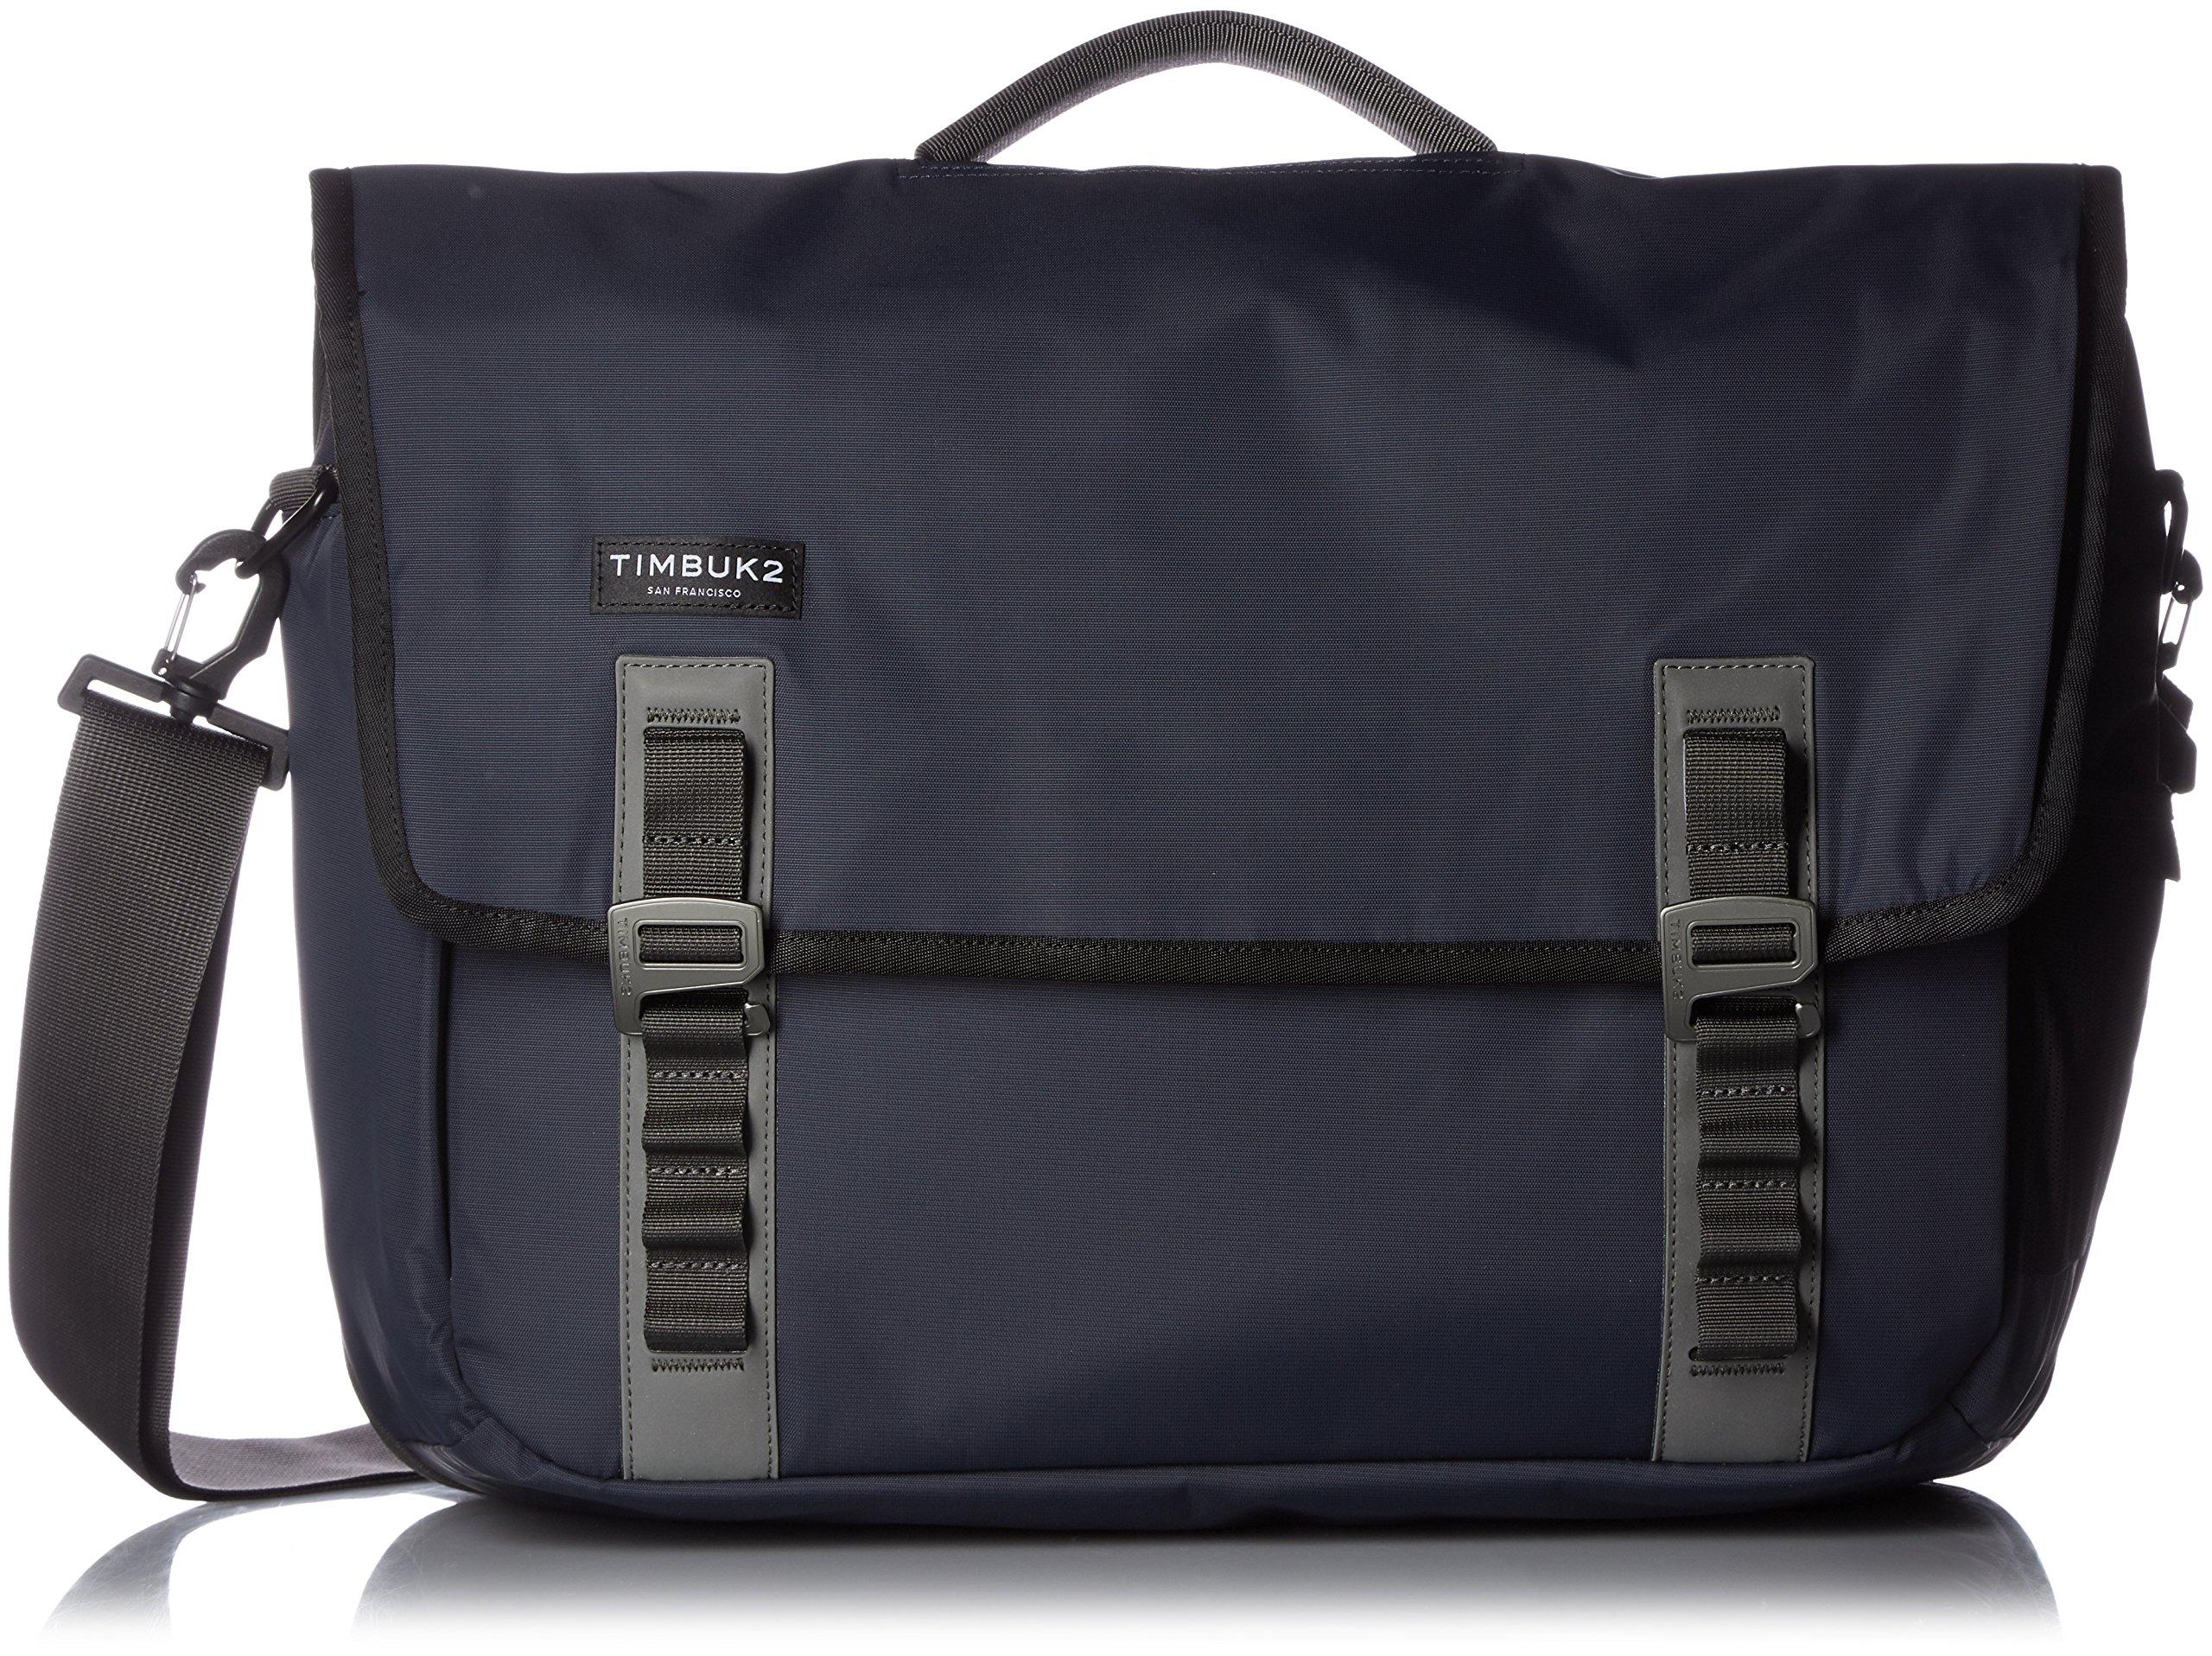 Timbuk2 Command Travel-Friendly Messenger Bag 2015, Nautical, l, Large